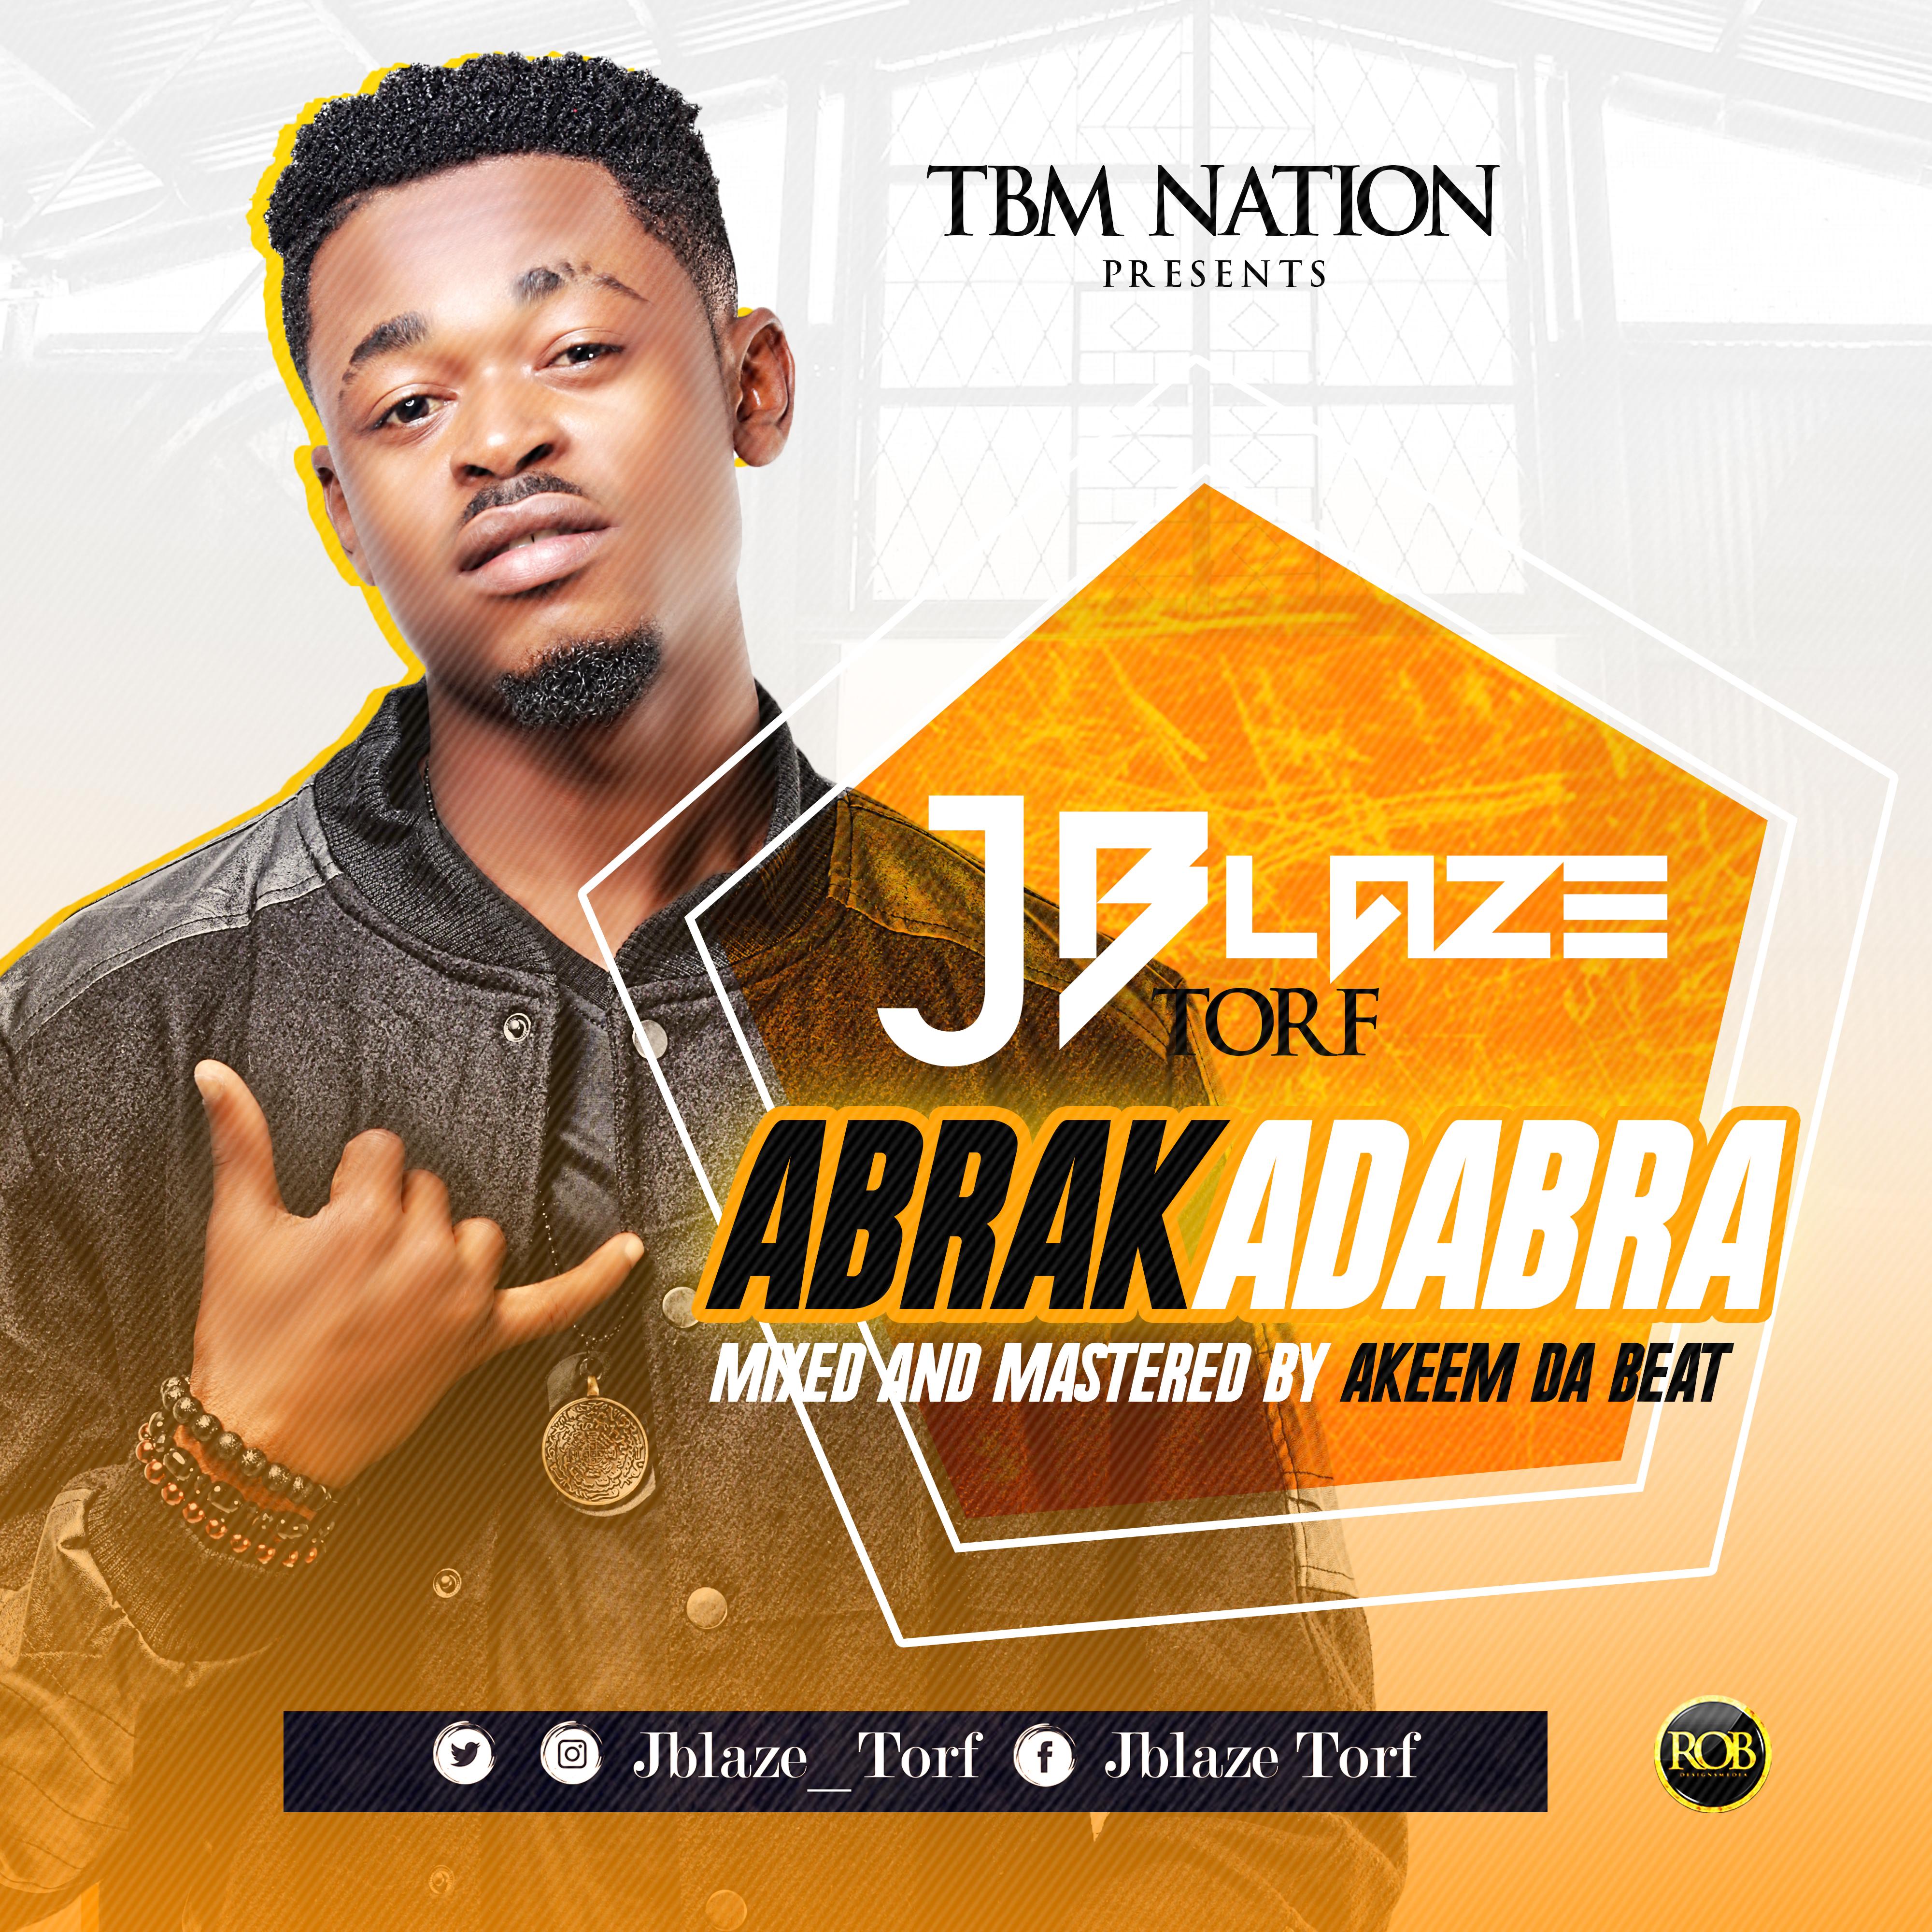 VIDEO: JBlaze Torf – Abrakadabra